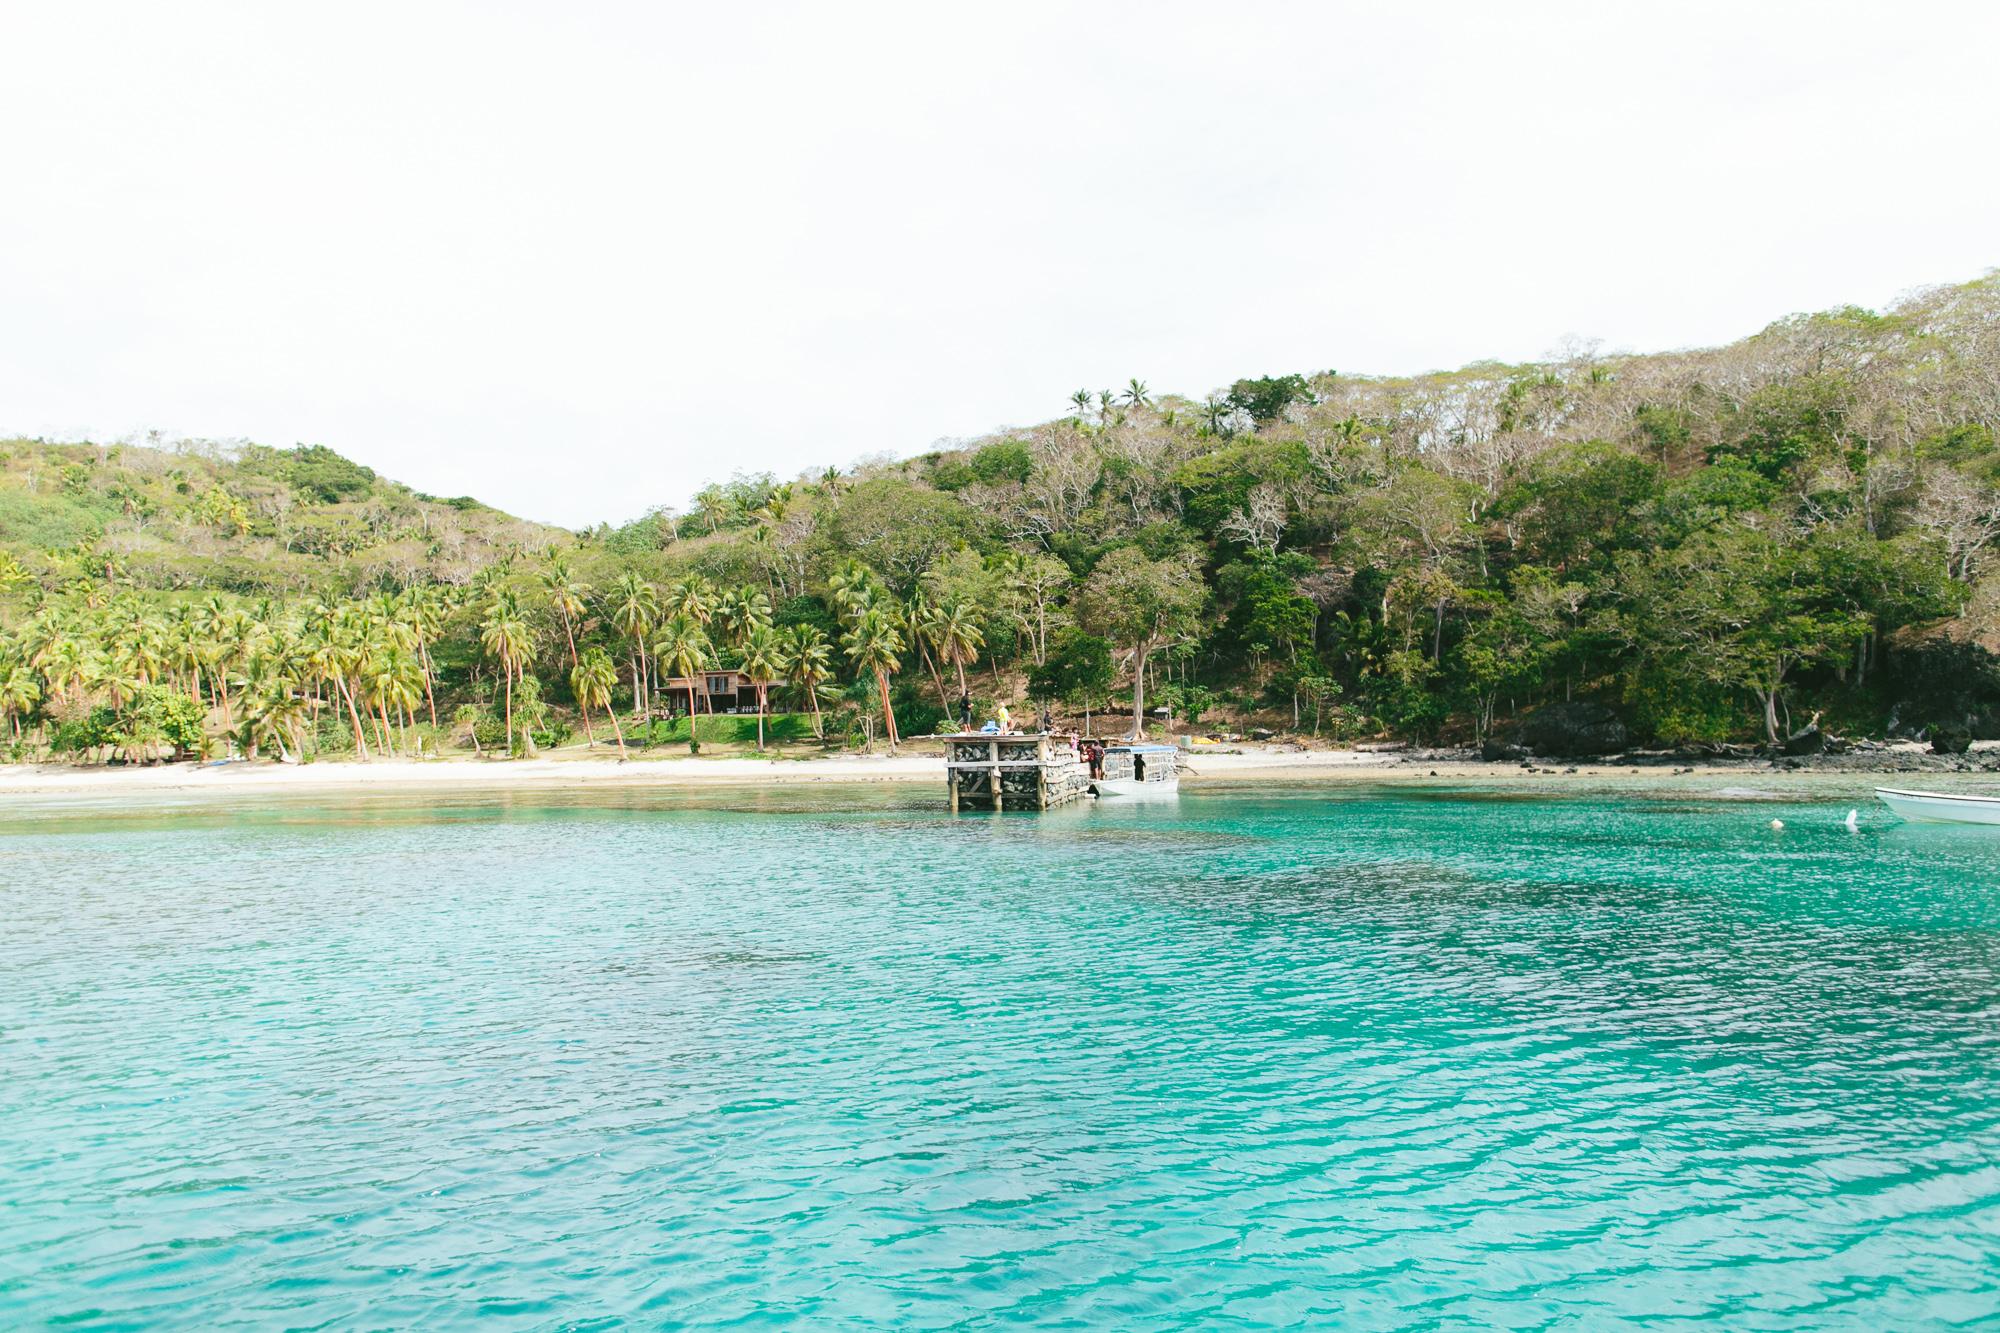 Arriving at The Remote Resort Fiji Islands